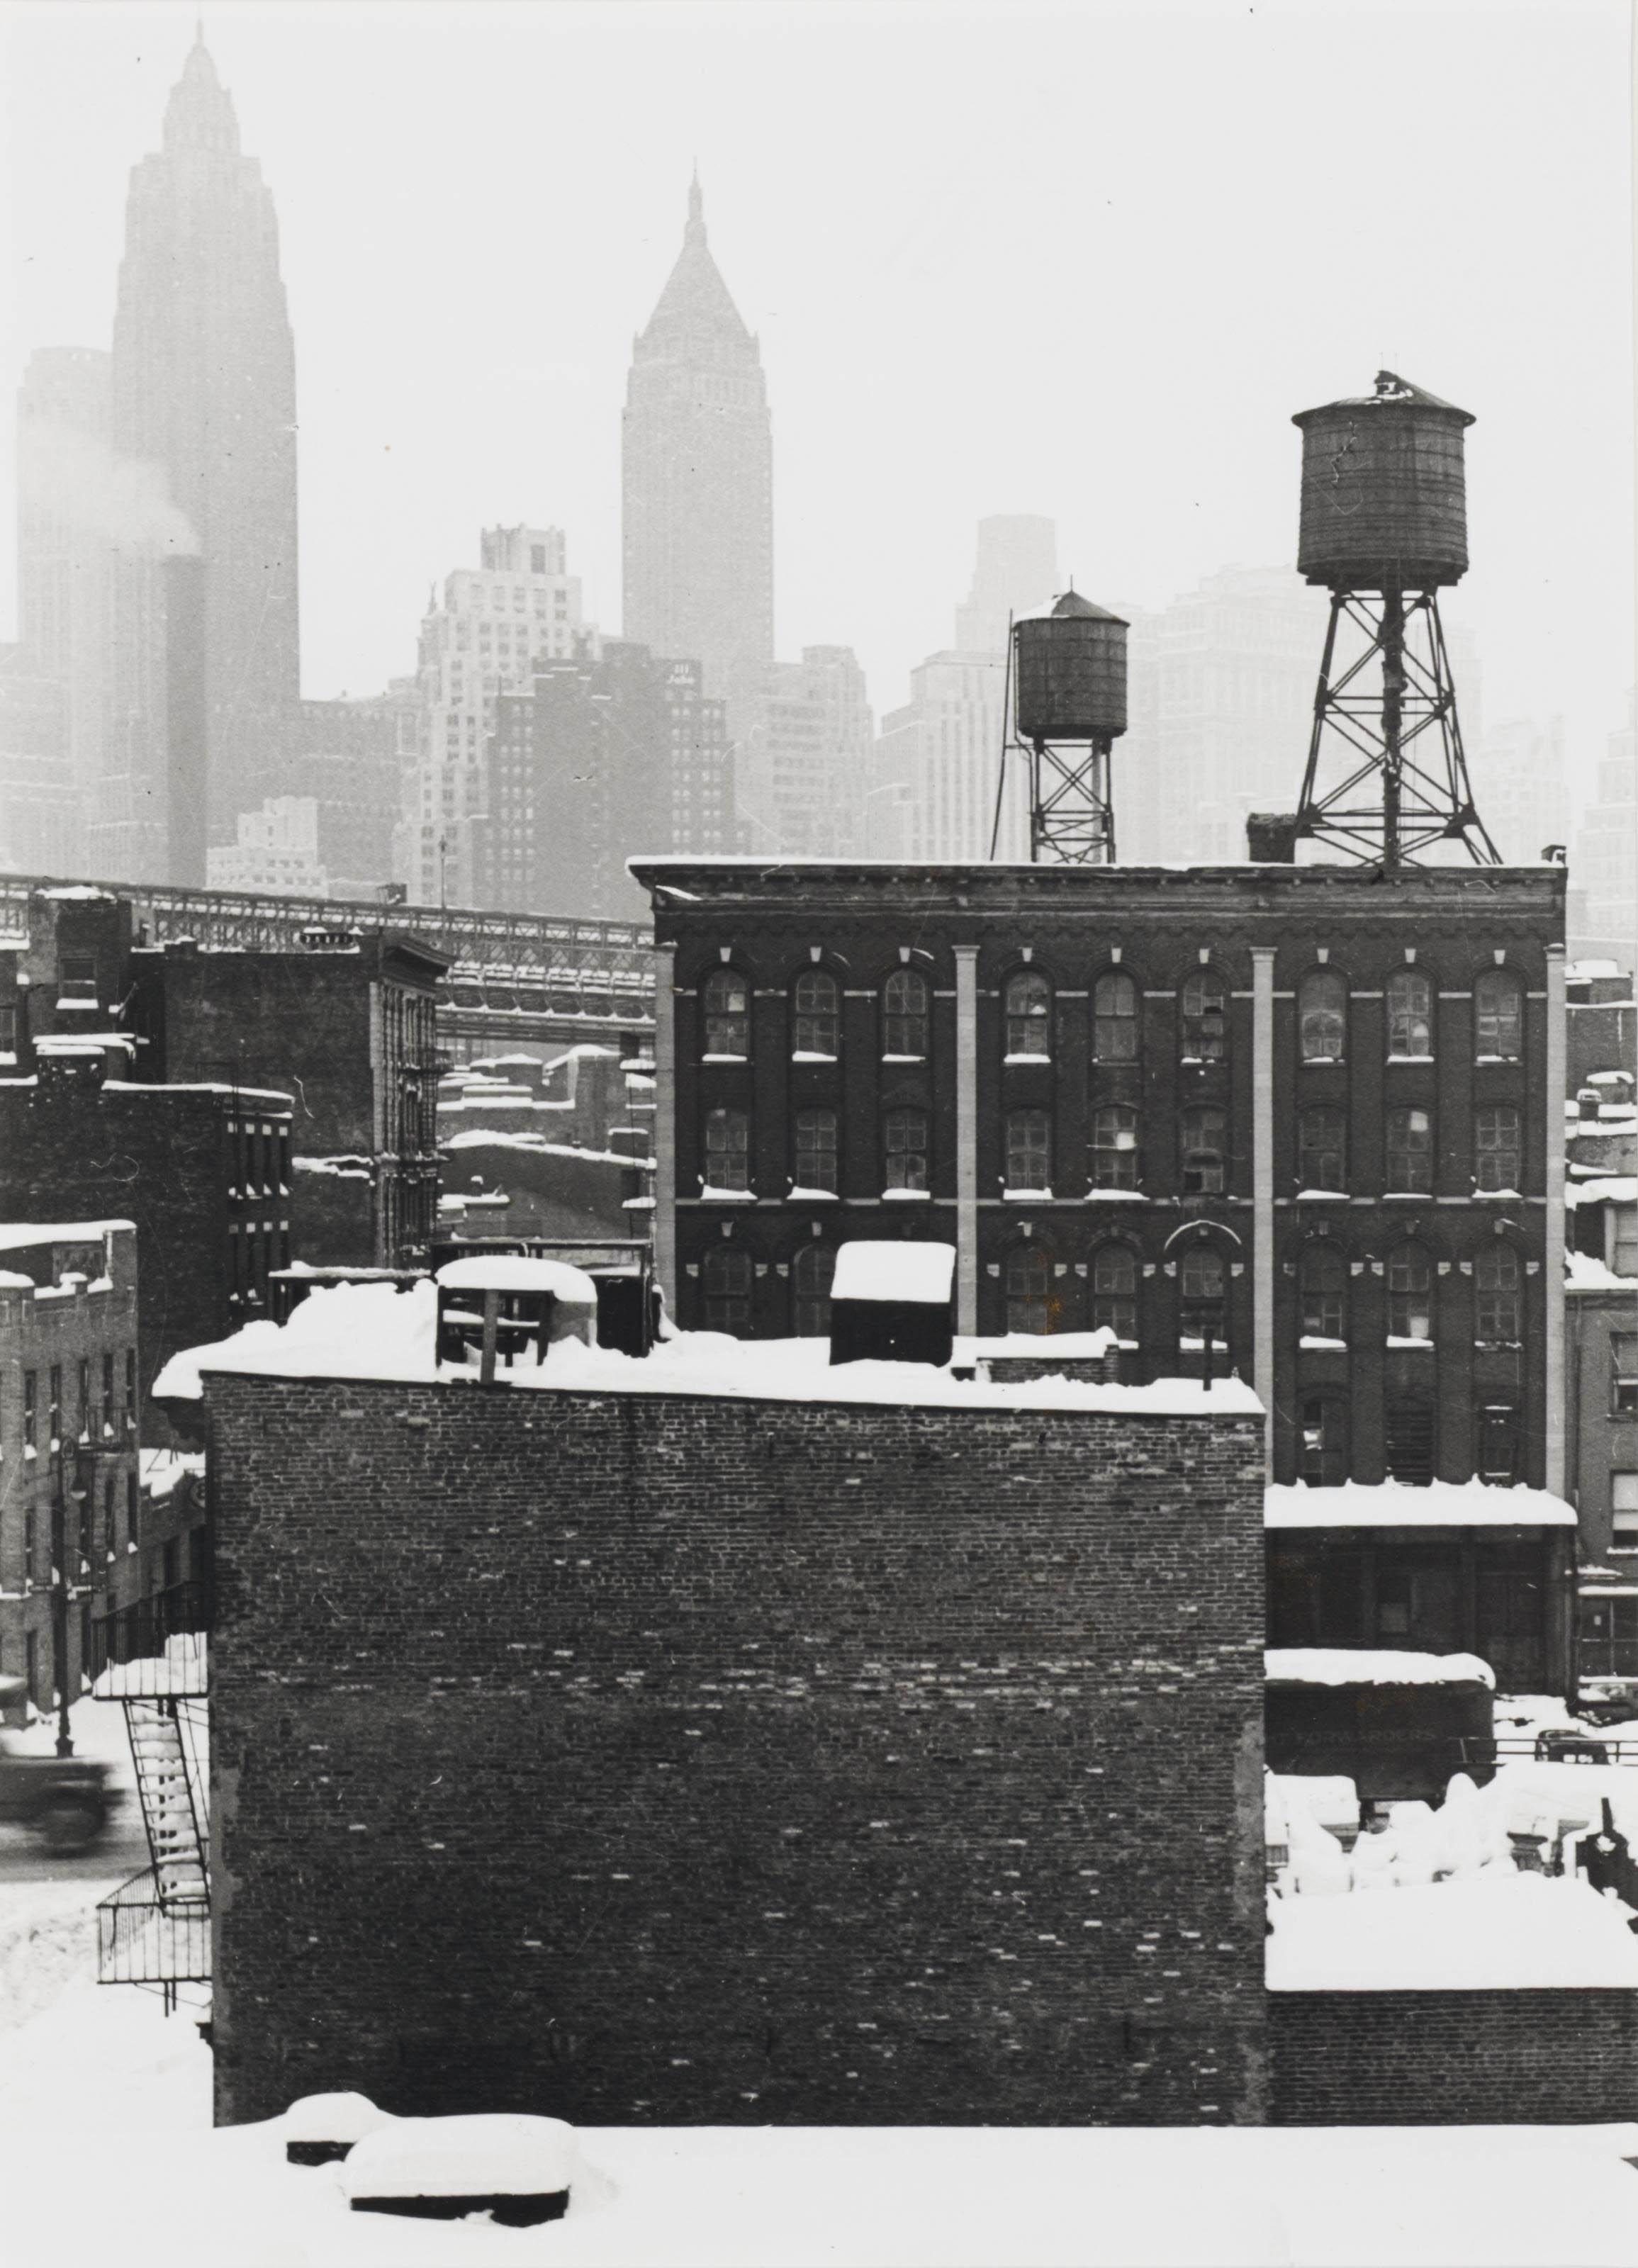 New York, c. 1948